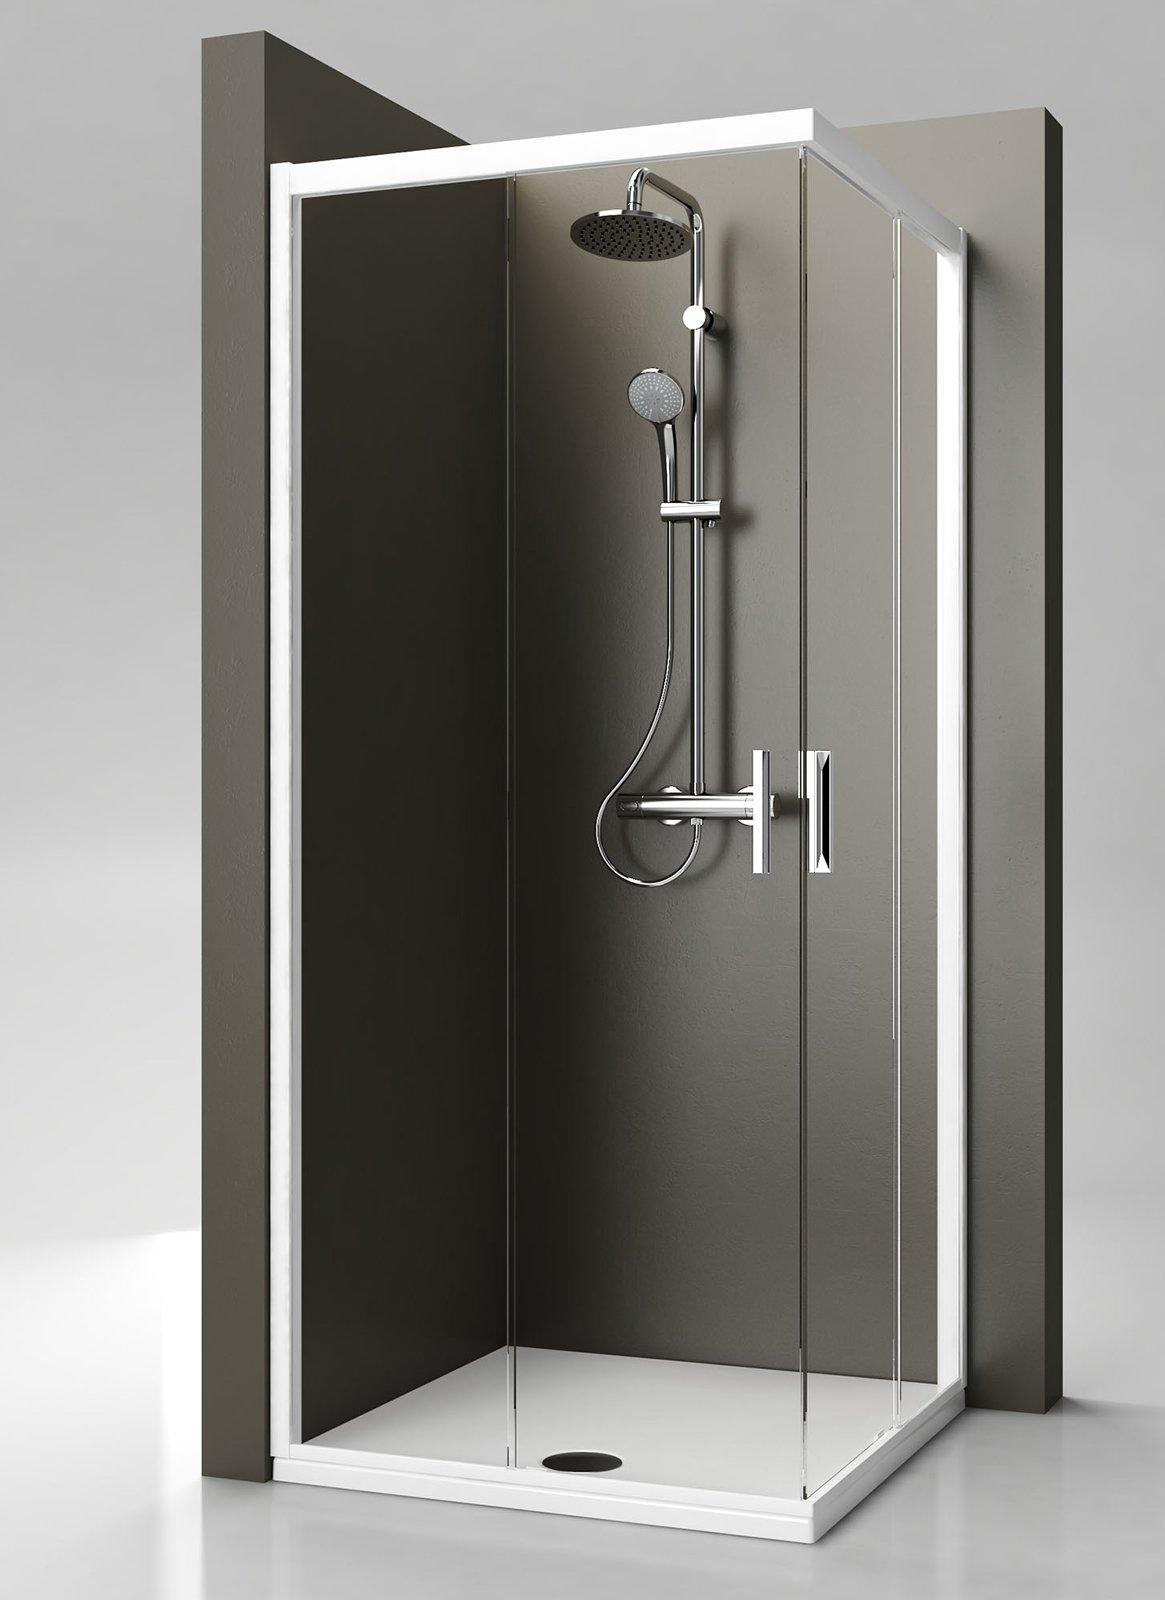 Dimensioni doccia rettangolari 28 images misure doccia rettangolari termosifoni in ghisa - Misure vasche da bagno rettangolari ...